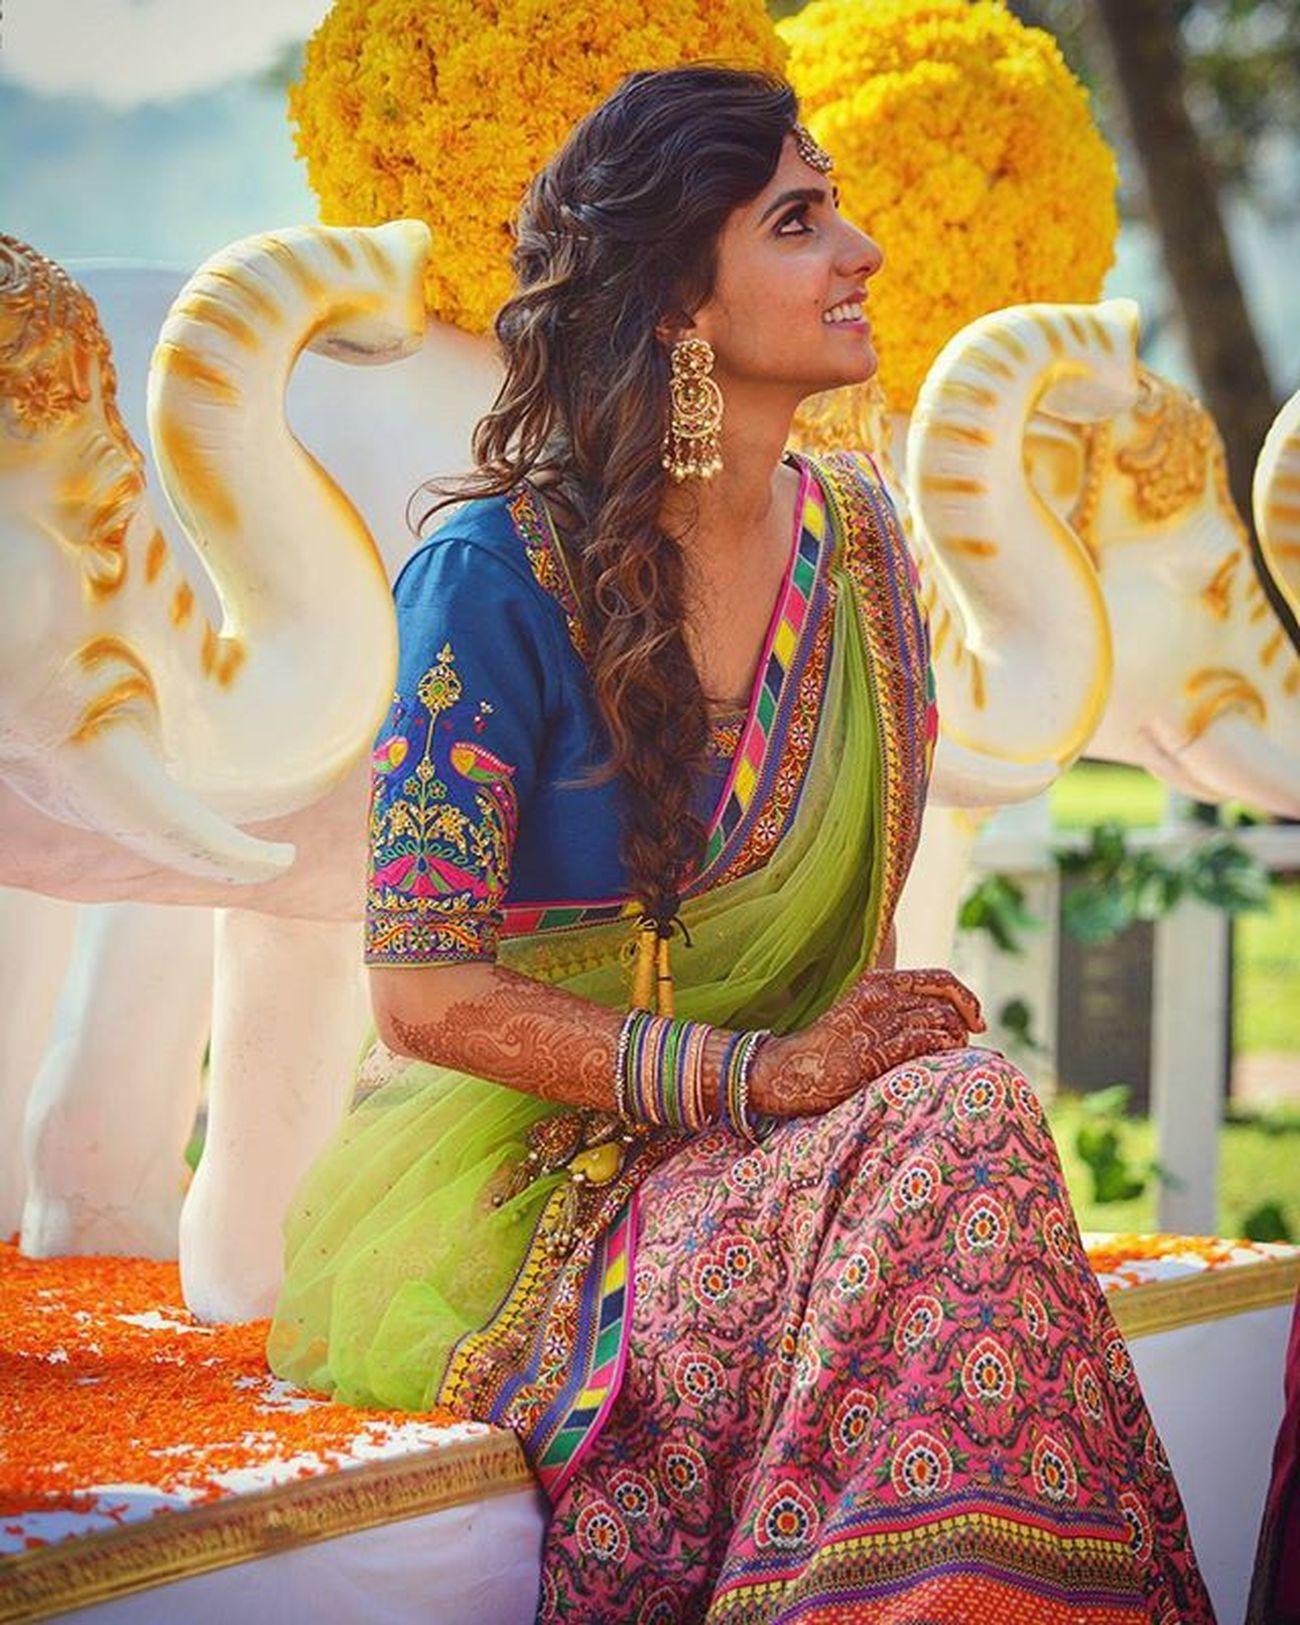 Aeshkydiwedding Gagans_photography Instachandigarh Chdtogoa Gagans_photography